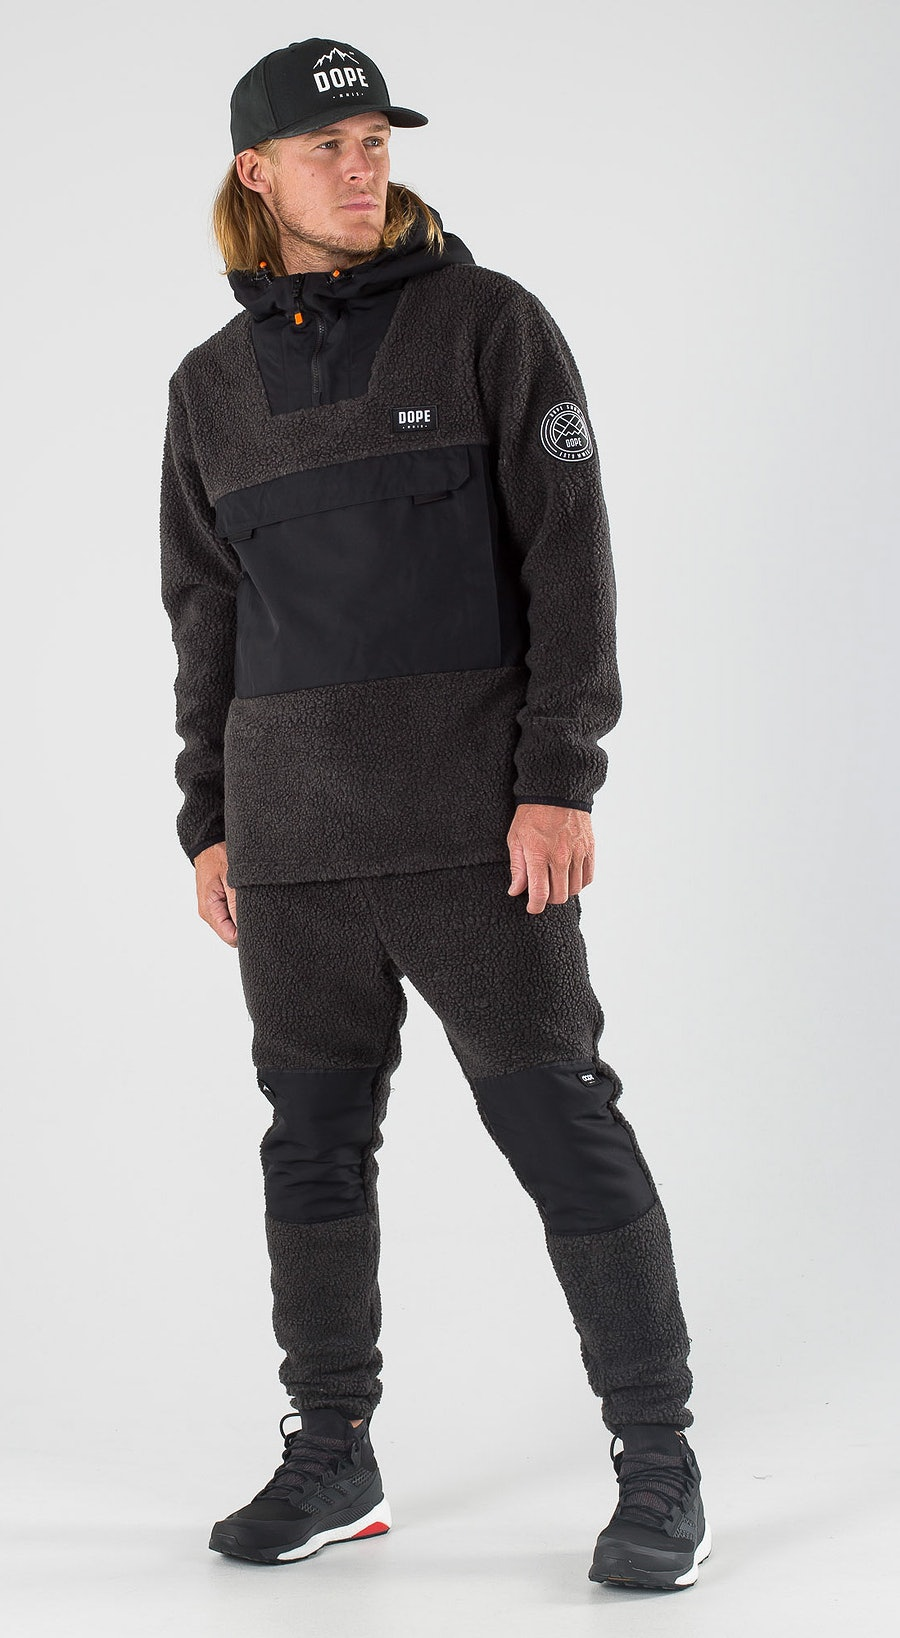 Dope Oi Black/Phantom Outfit Multi